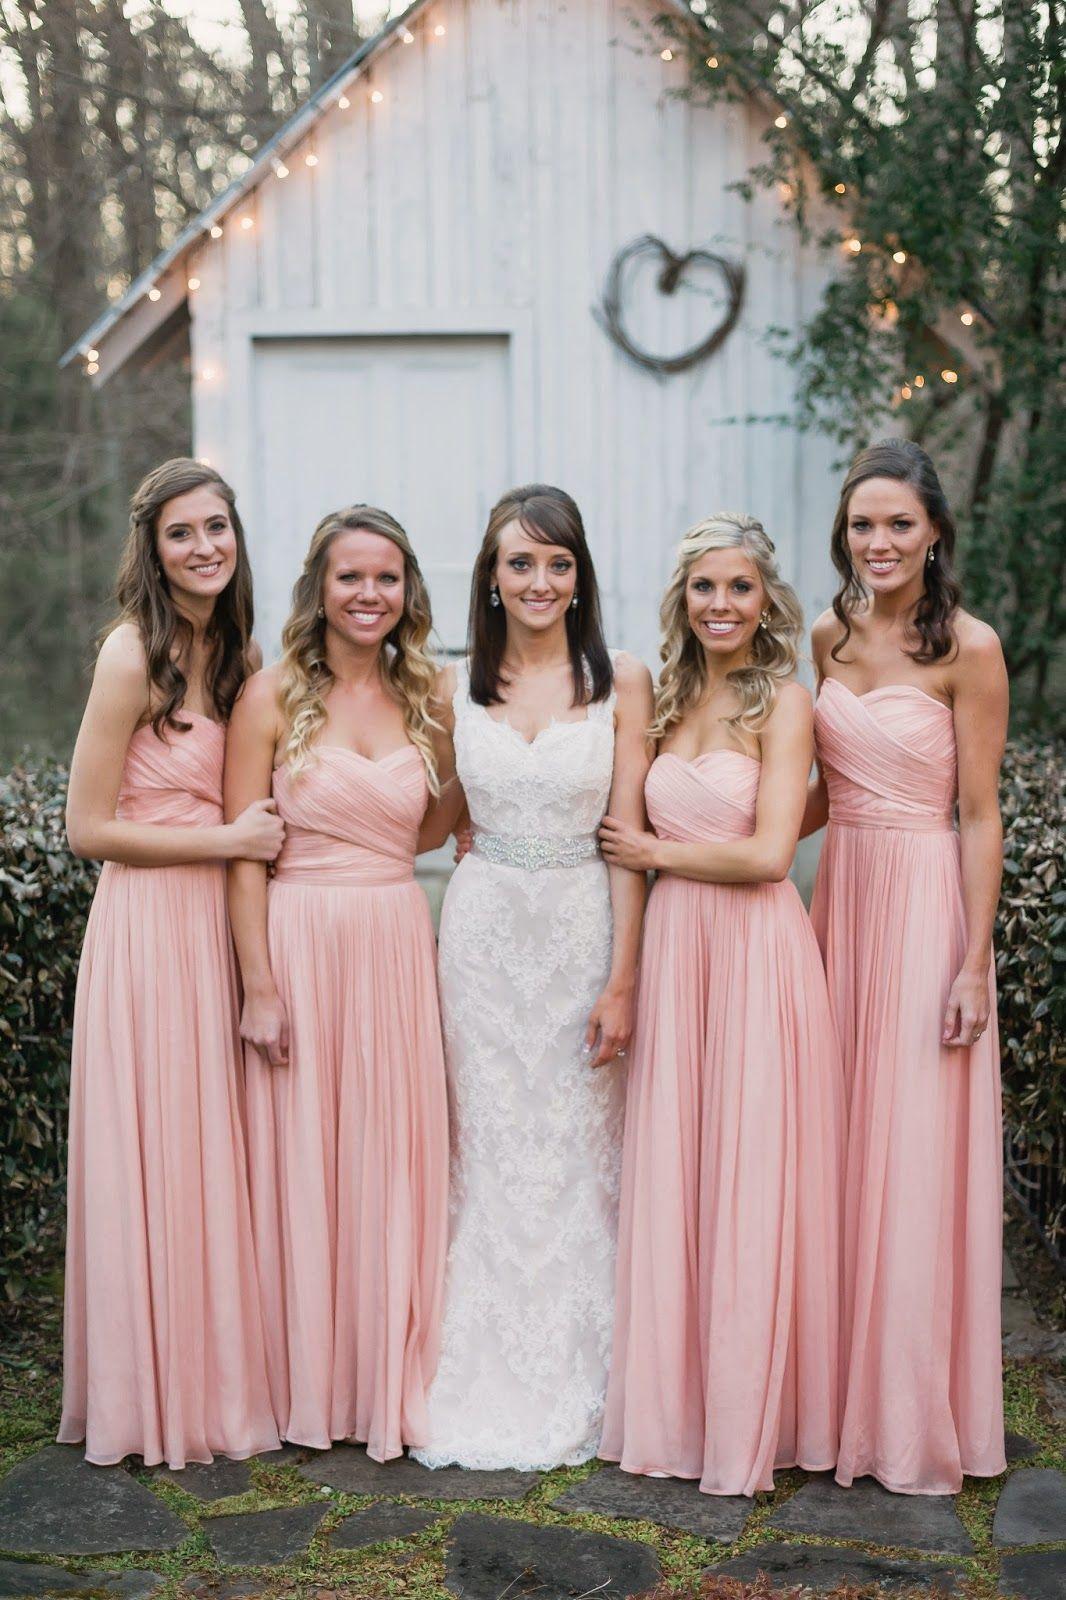 Lace Marisa wedding gown and crystal sash; J. Crew bridesmaids ...